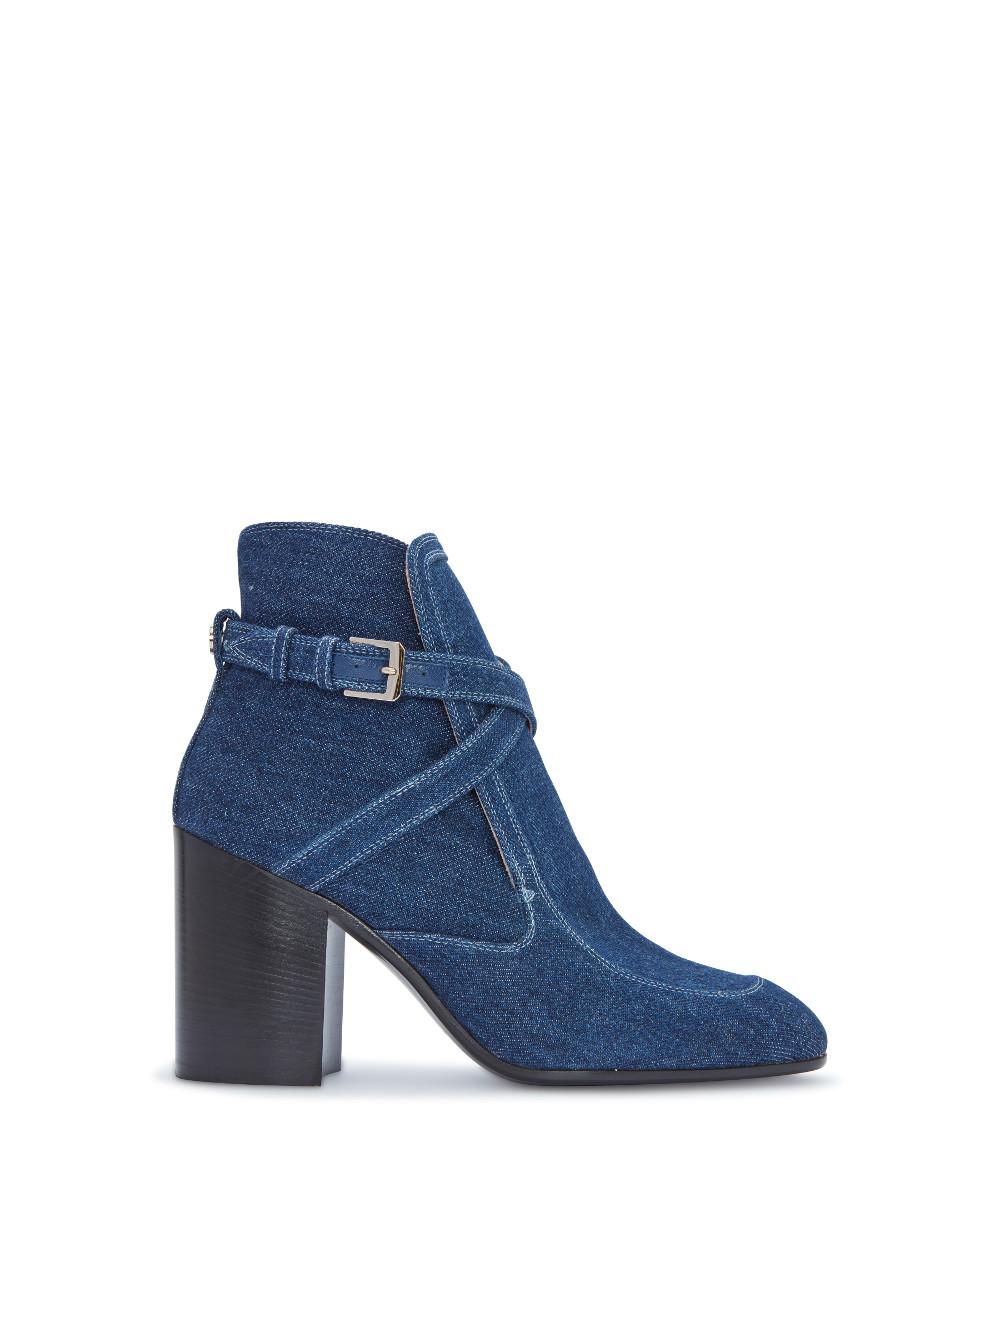 LD_PF18_Tomia_Jeans Blue_5488.jpg